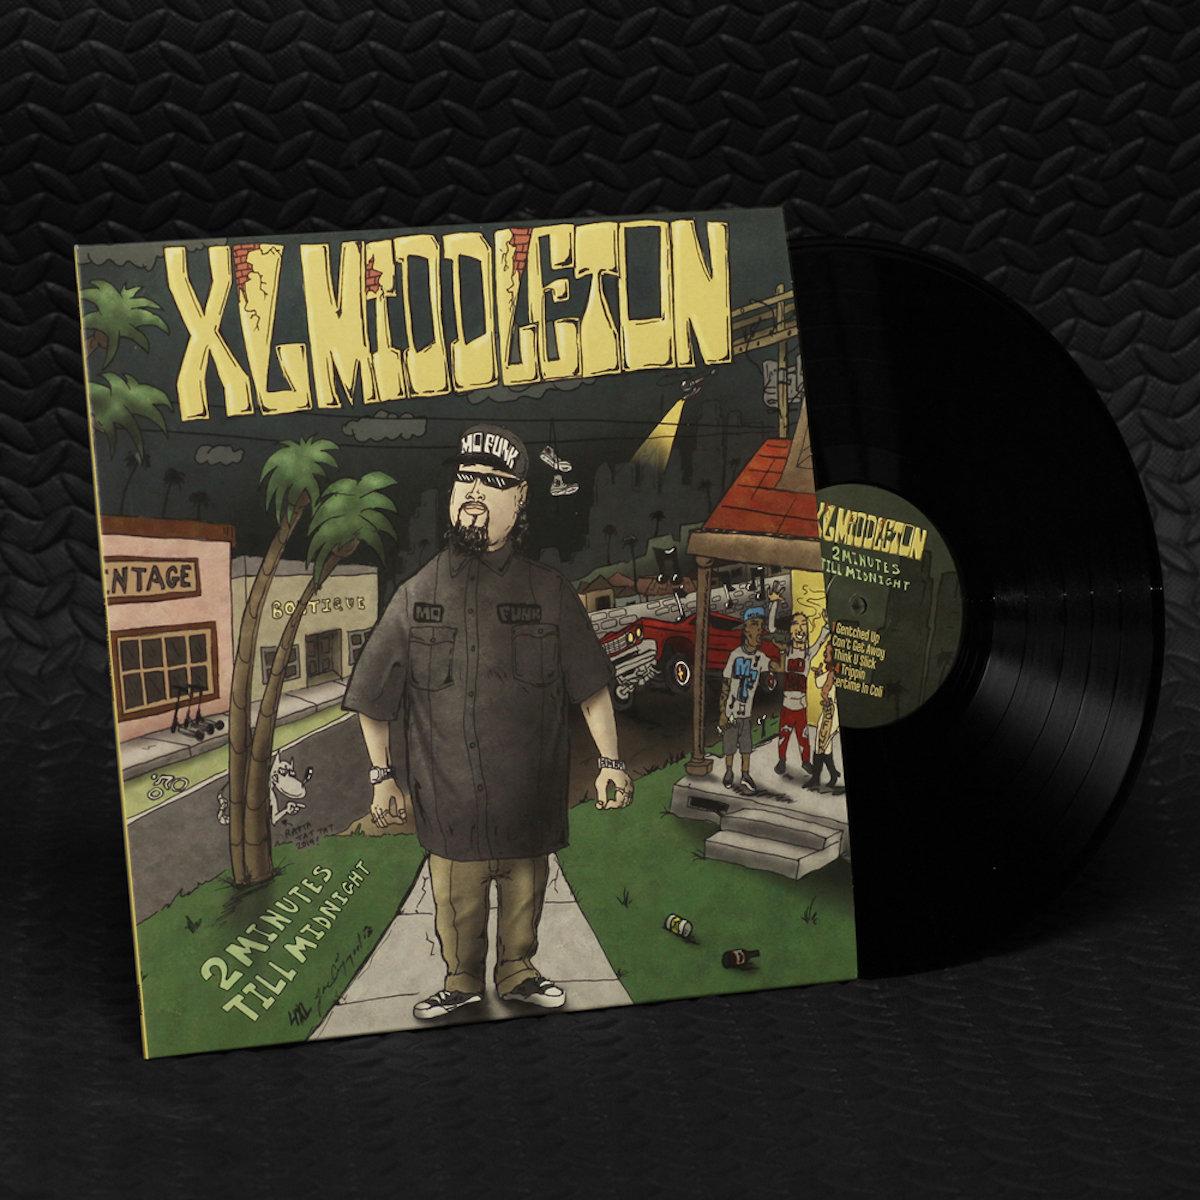 Tingle Down Below Xl Middleton Mofunk Records